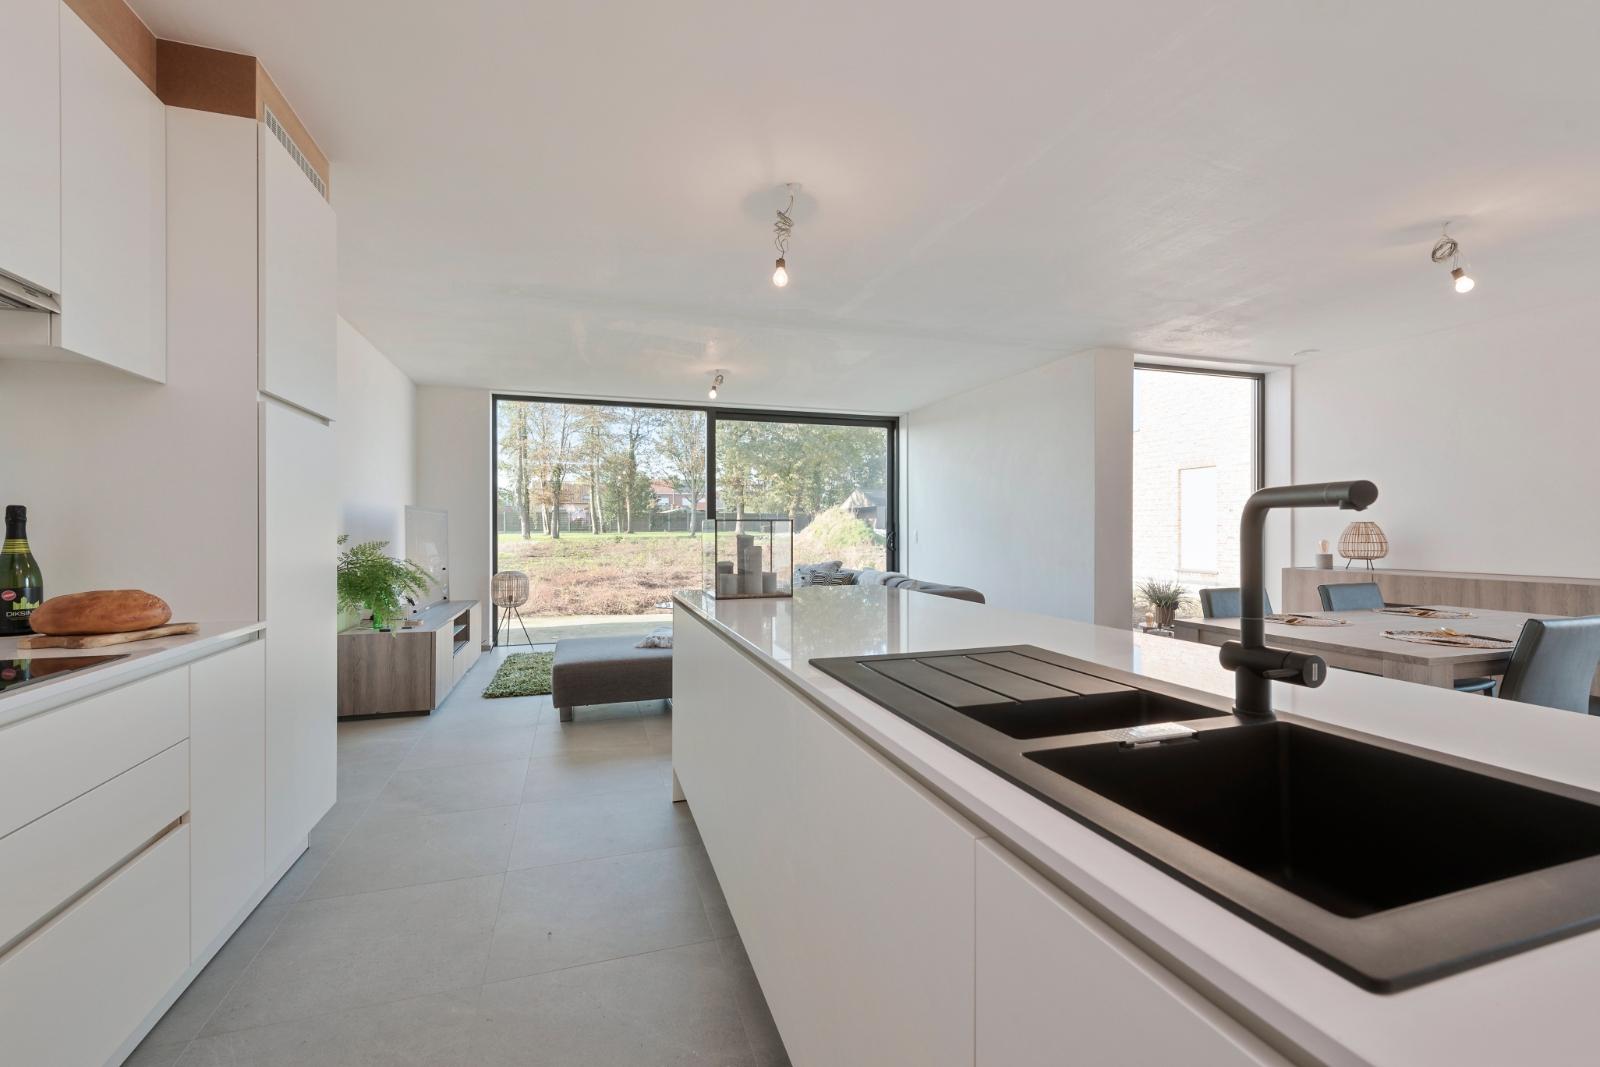 Prachtige moderne nieuwbouwwoning nabij centrum Esen - 12